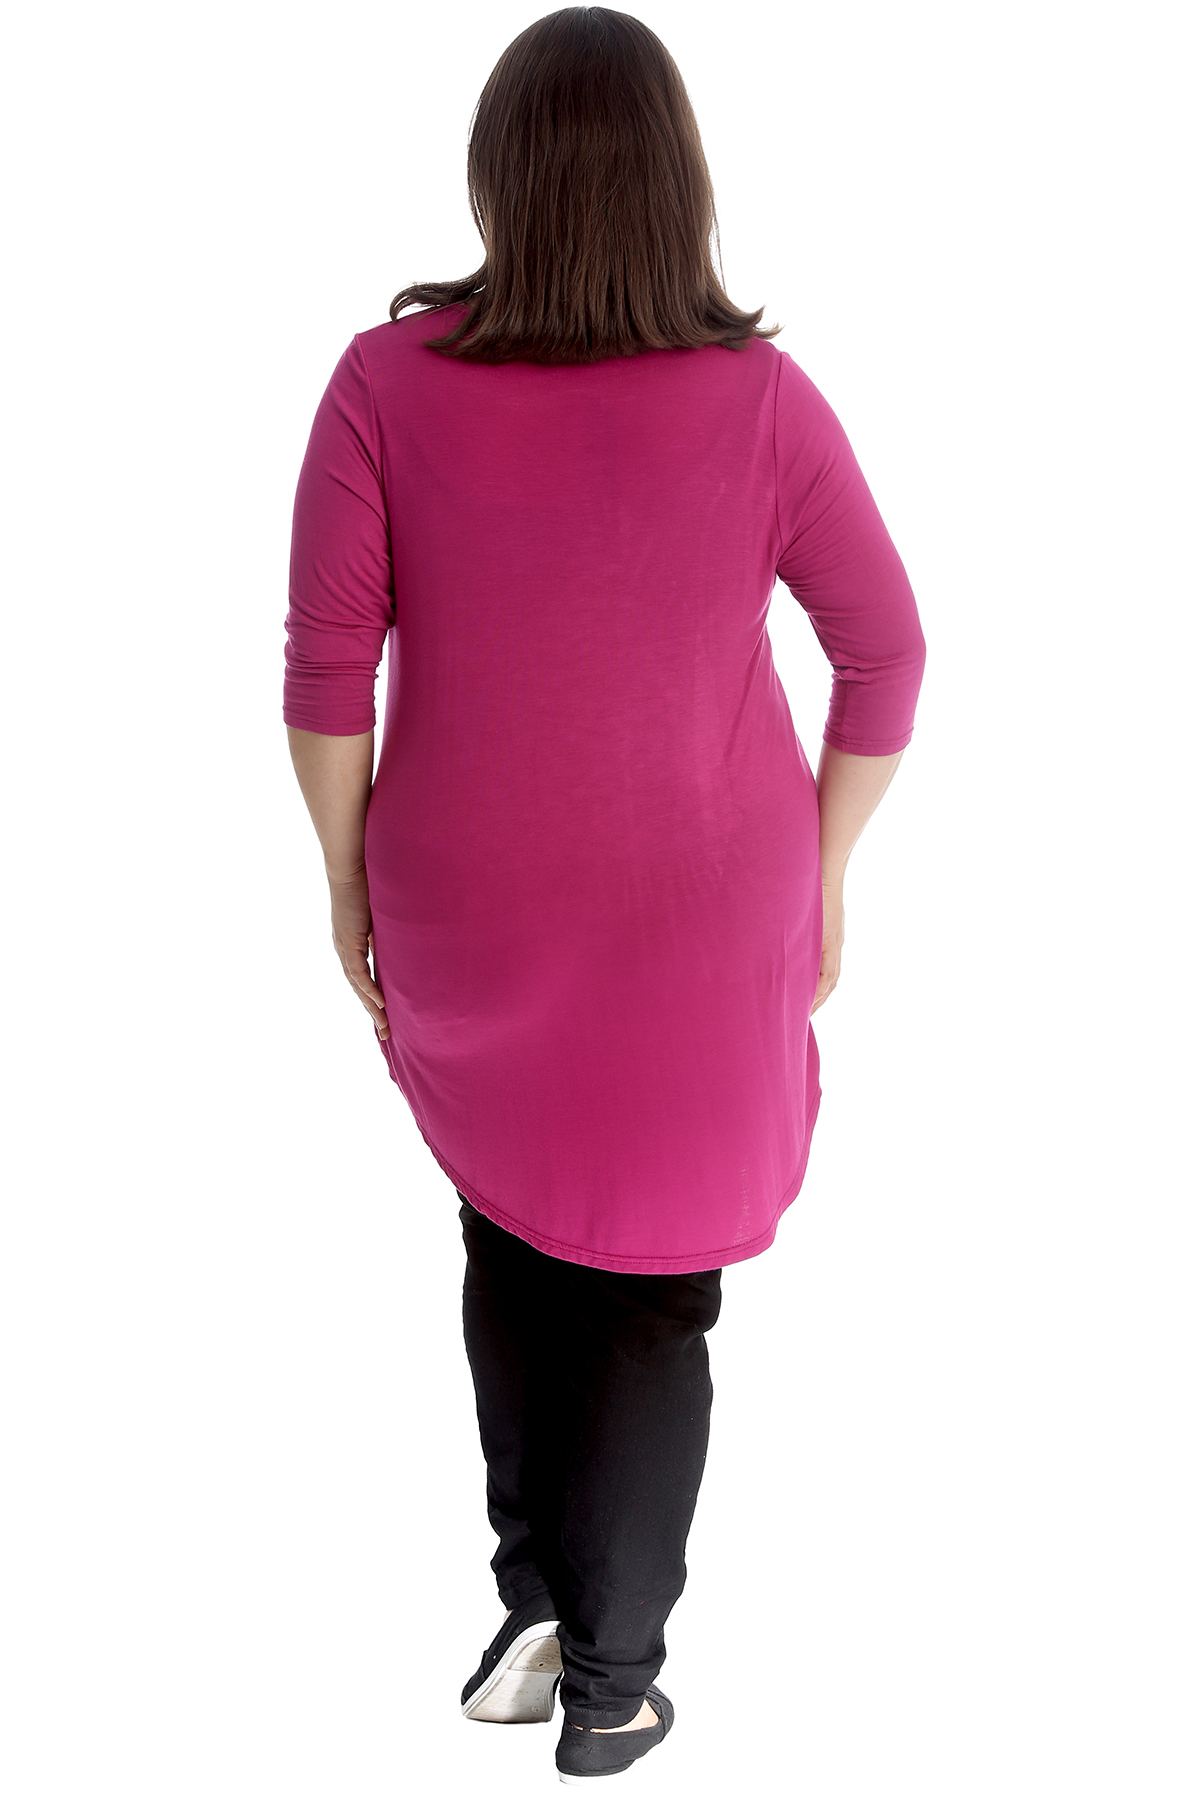 Ladies Top Plus Size Womens Studded Christmas Xmas Tree Dip Hem Shirt Nouvelle